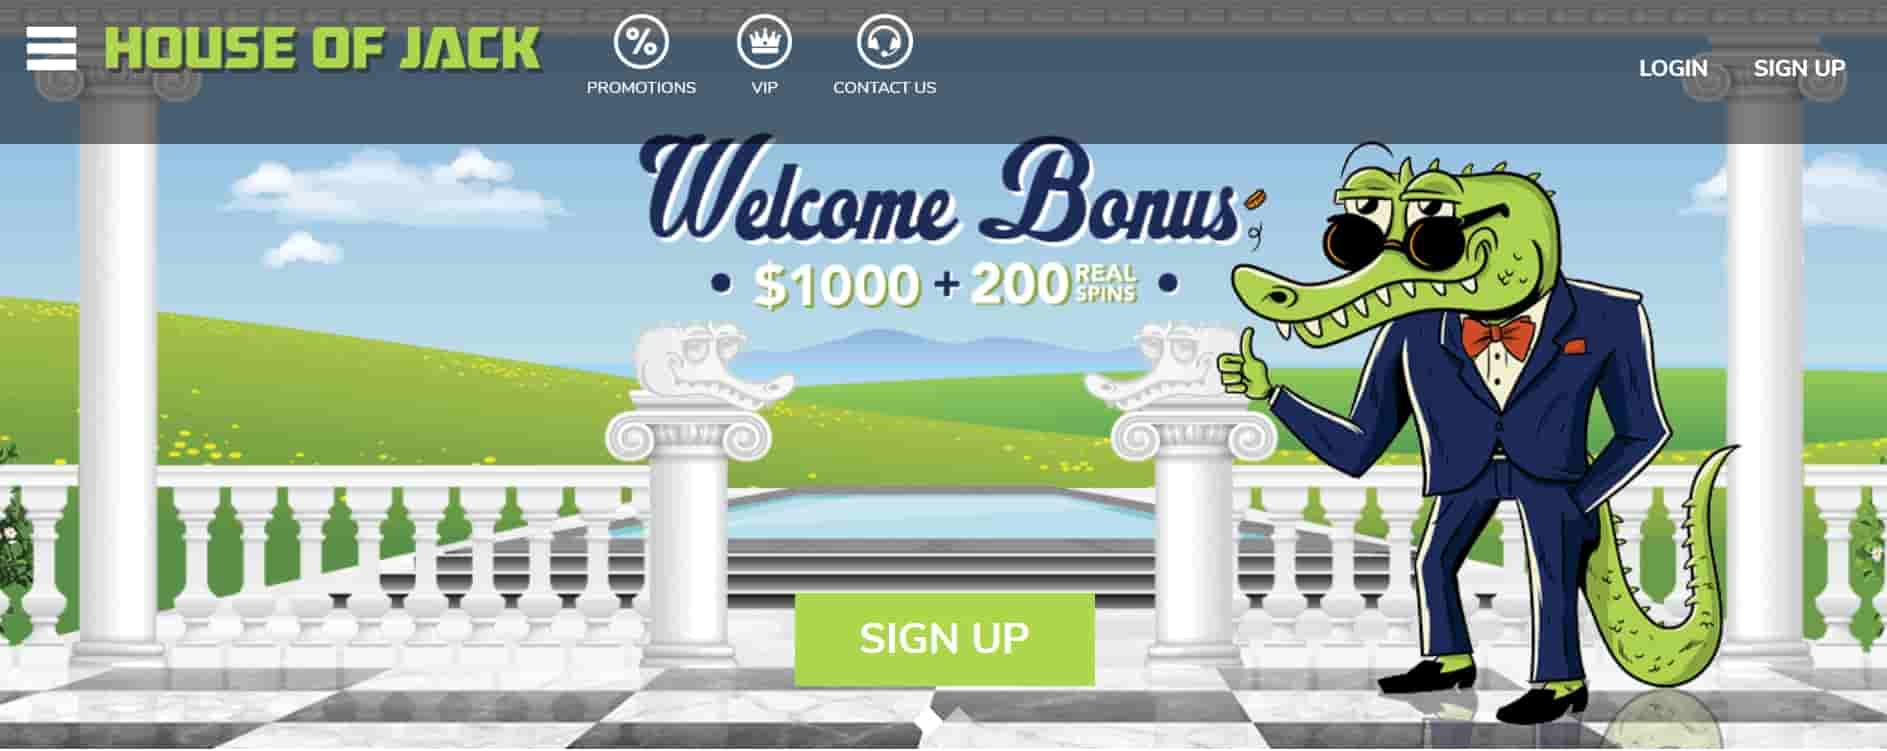 Online Casino HouseofJack canada